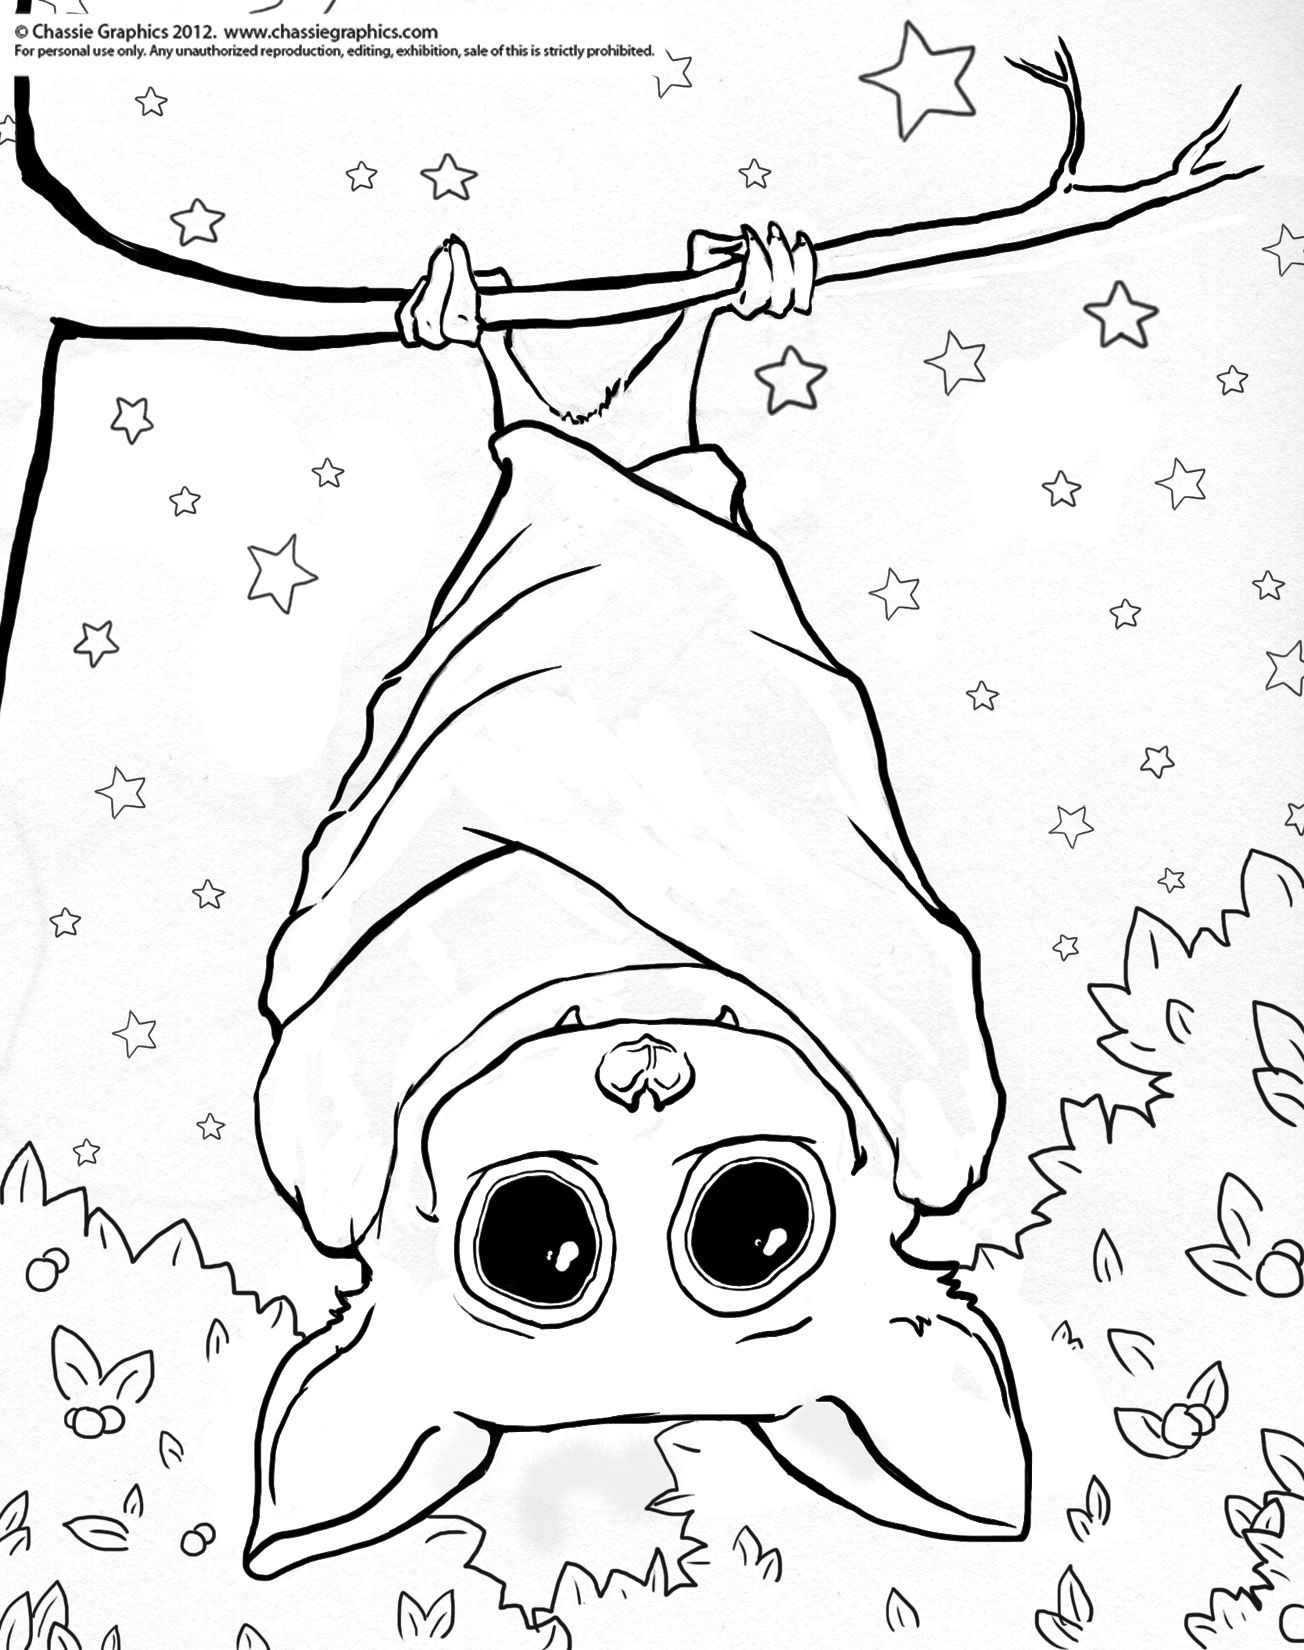 Bat coloring pages : picture id 2137624088 | Bat coloring ...